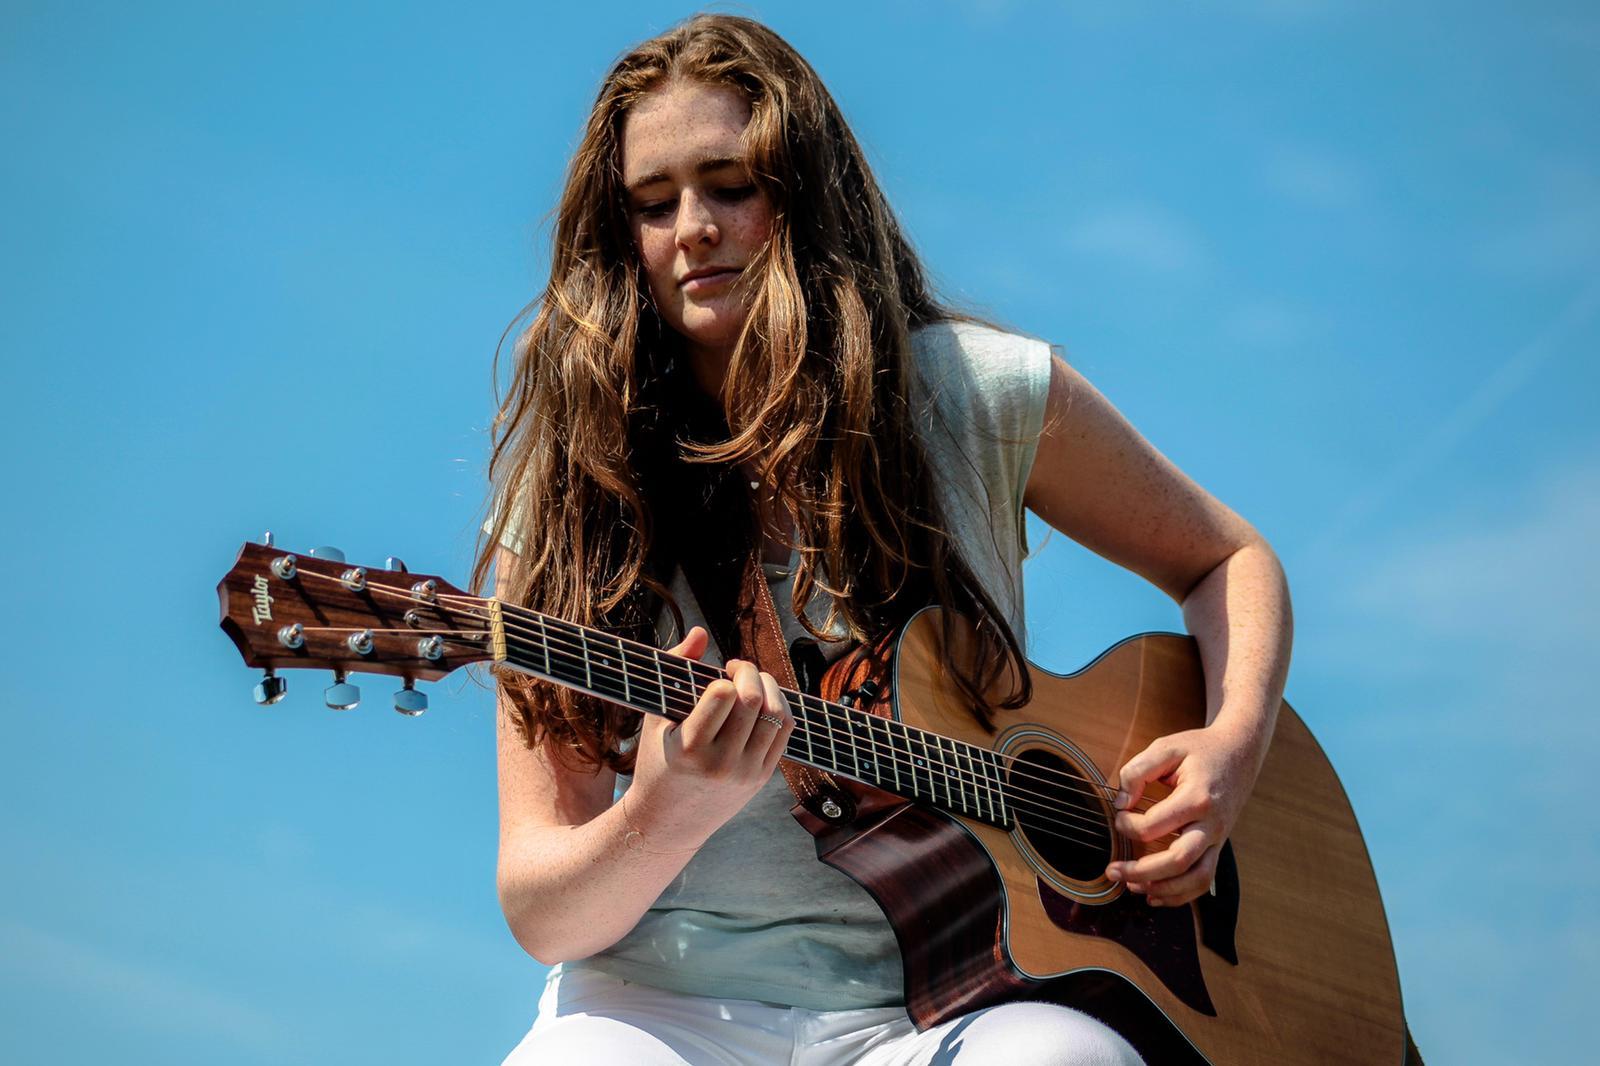 Live Music - Anouska Assisi at The Angel Inn